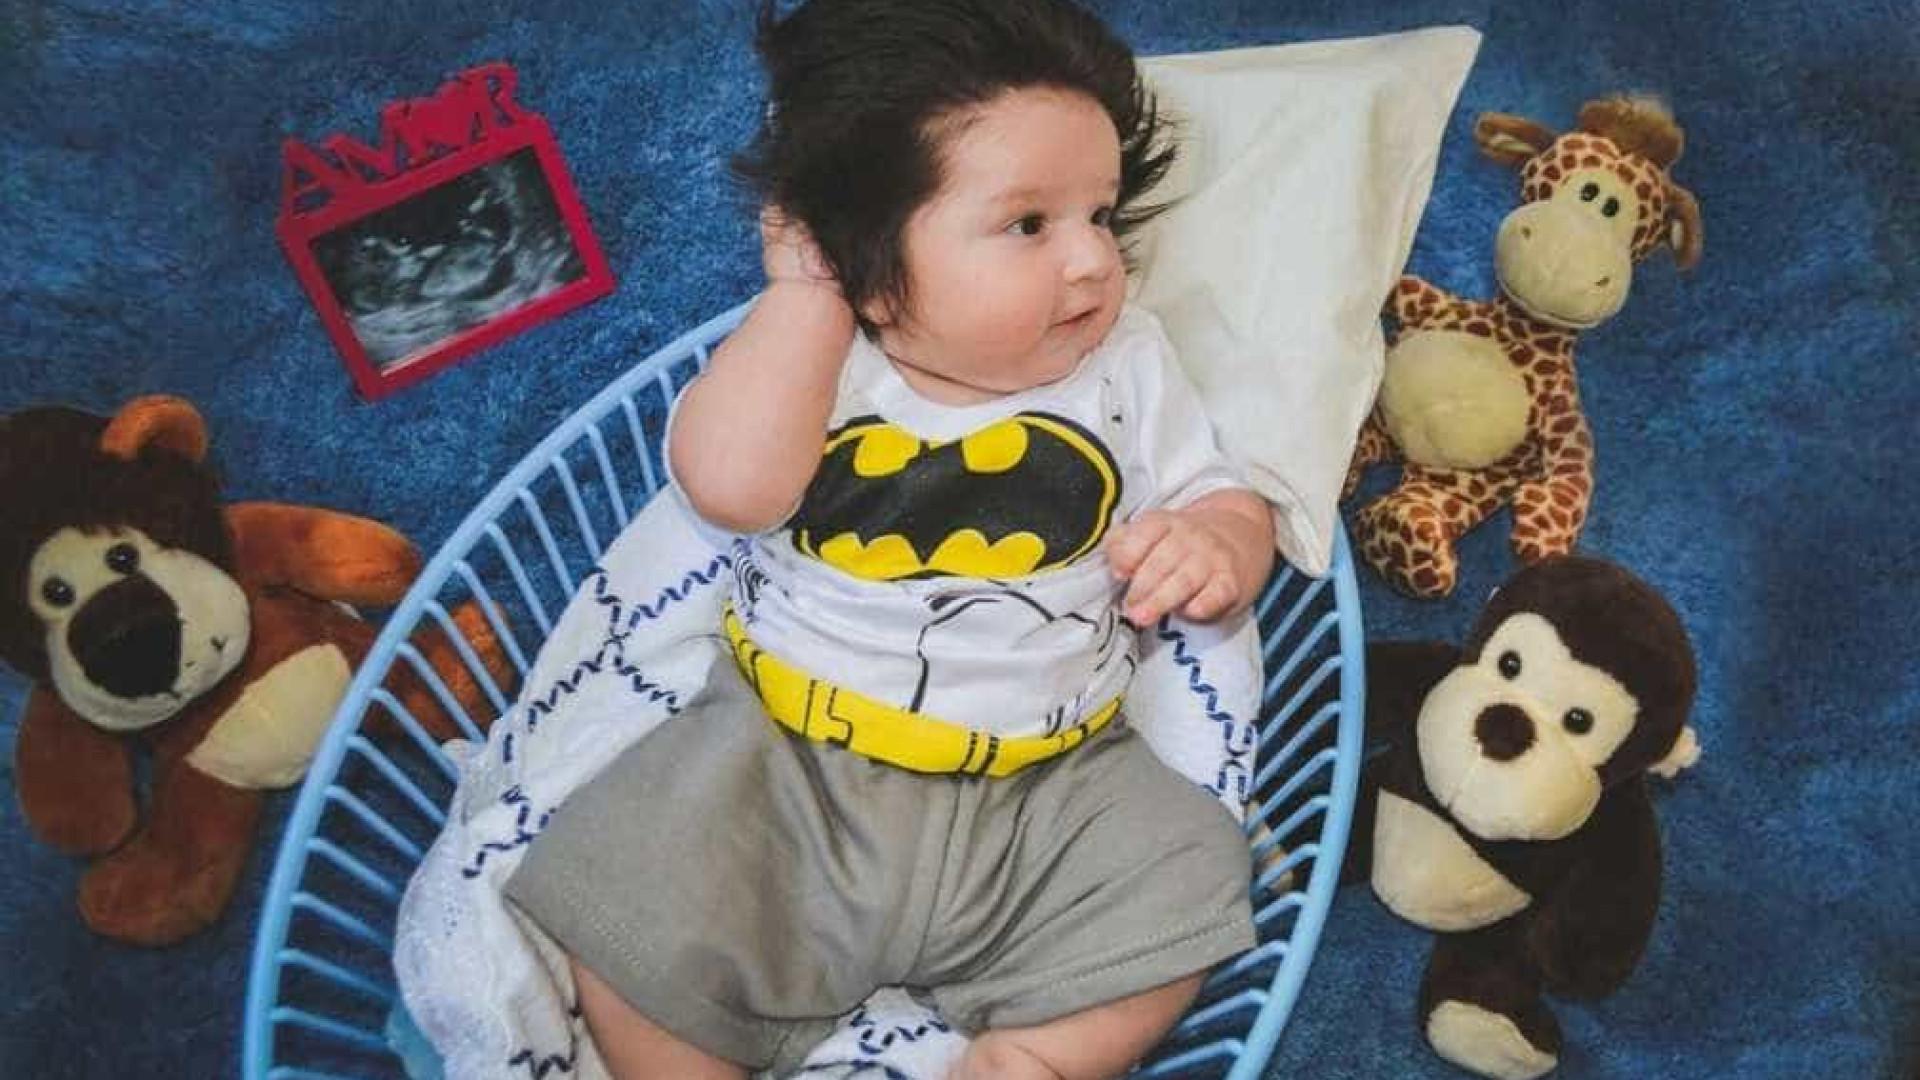 Bebê recebe vacina errada e mãe culpa cabelo